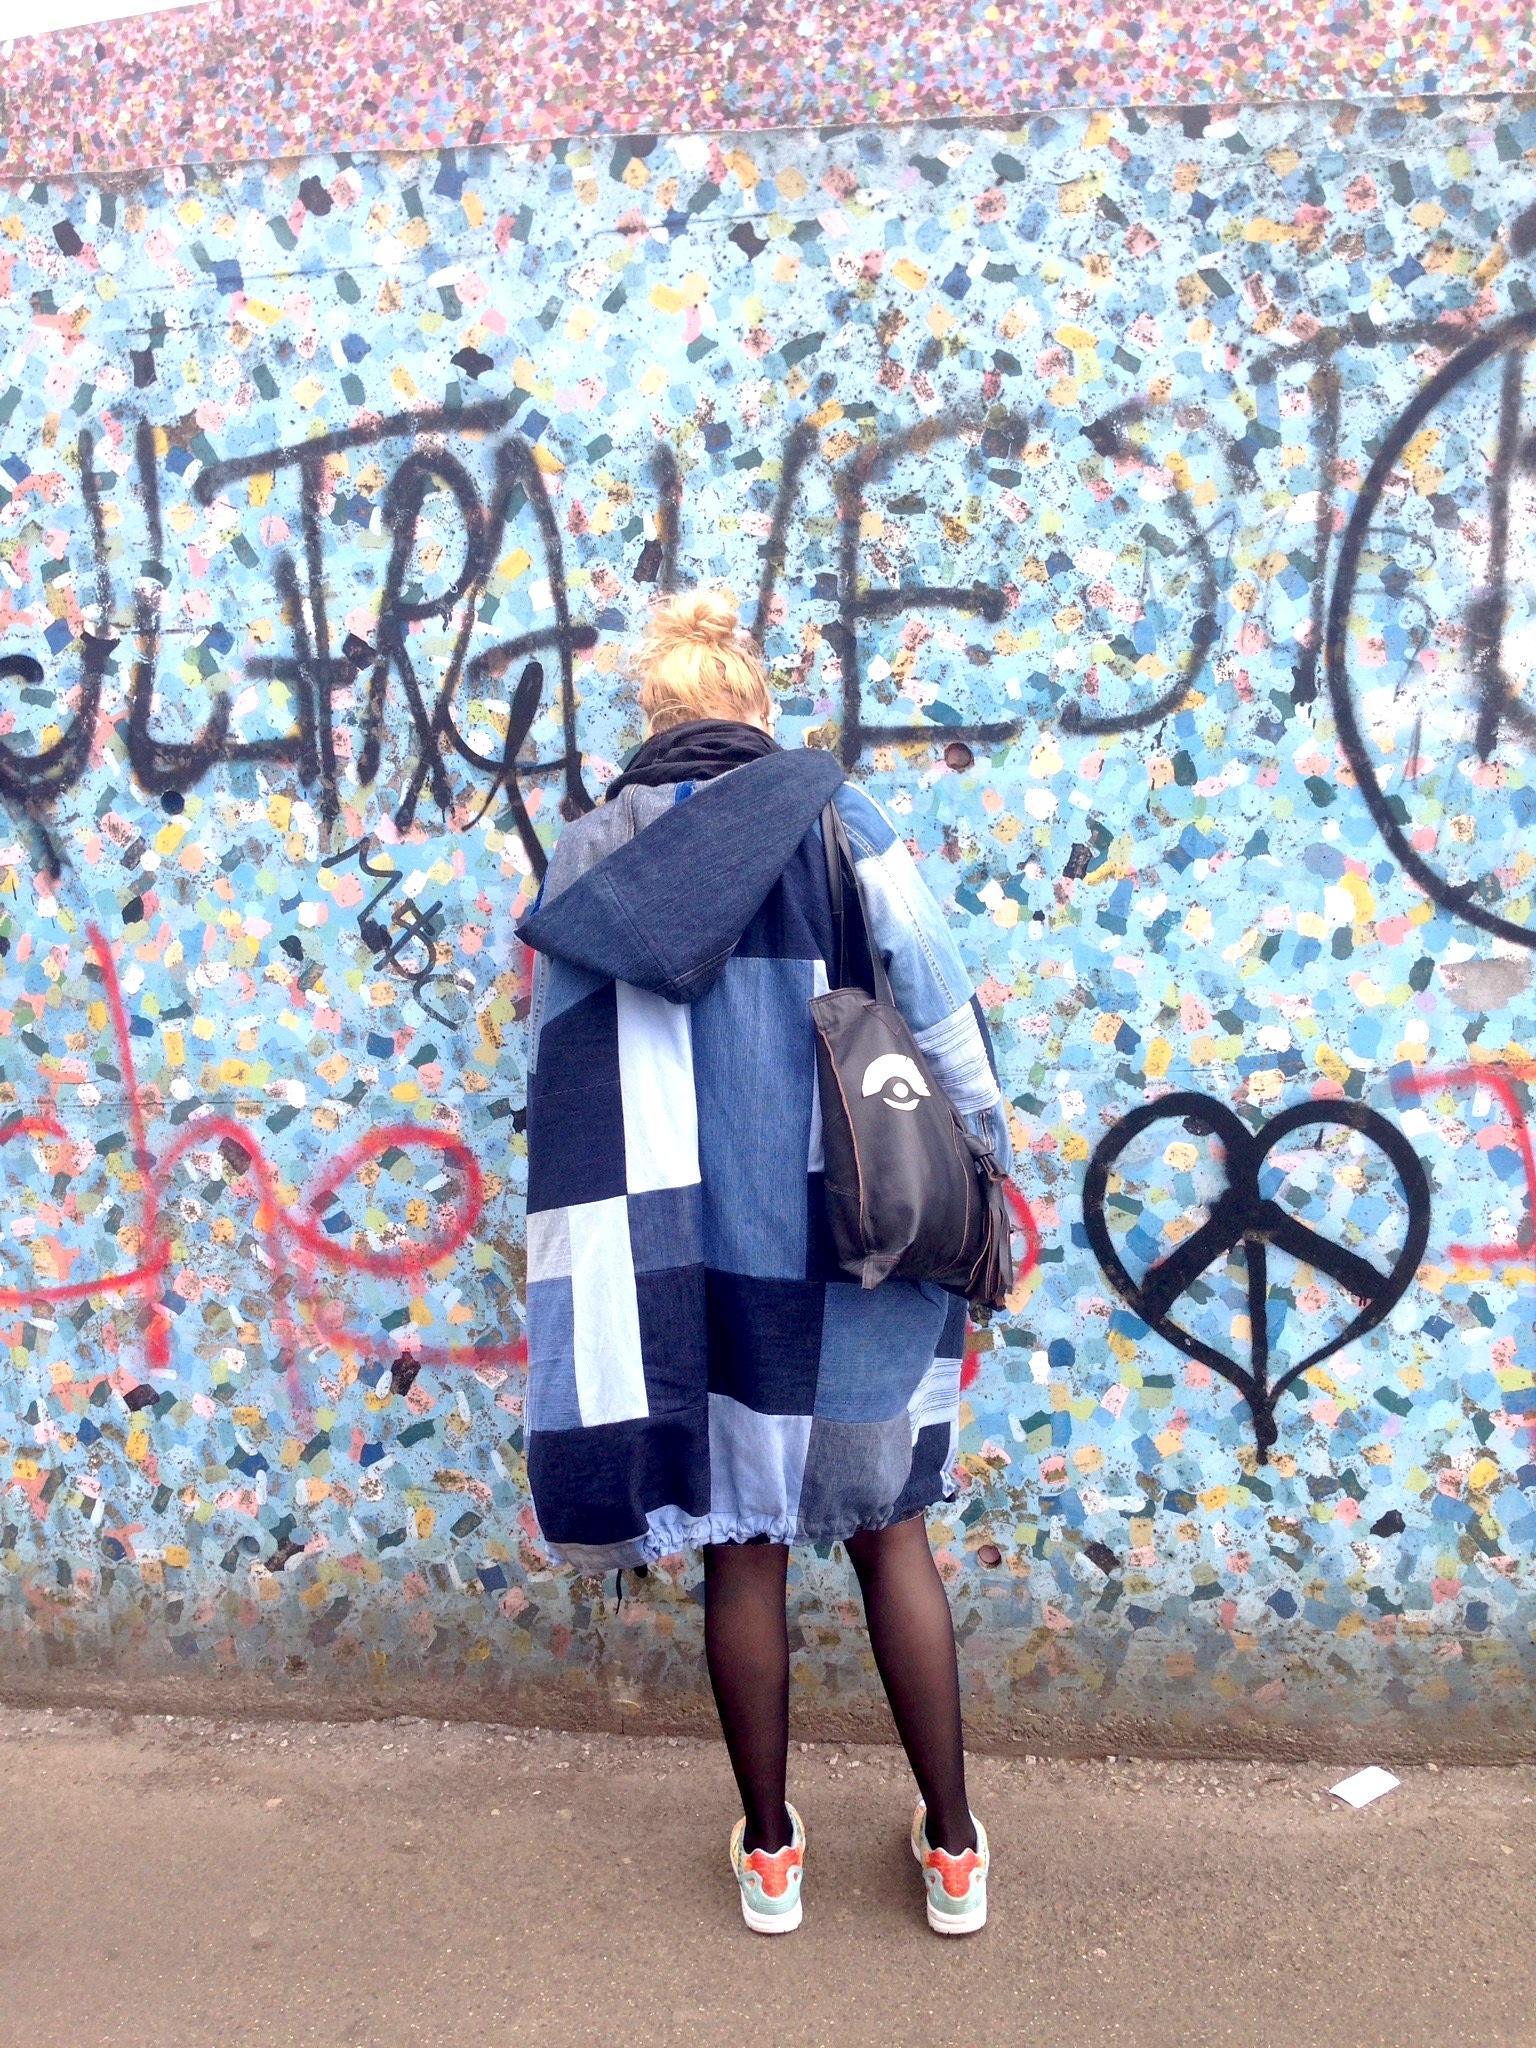 Susanna in her diy denim quilt jacket and diy leather bag